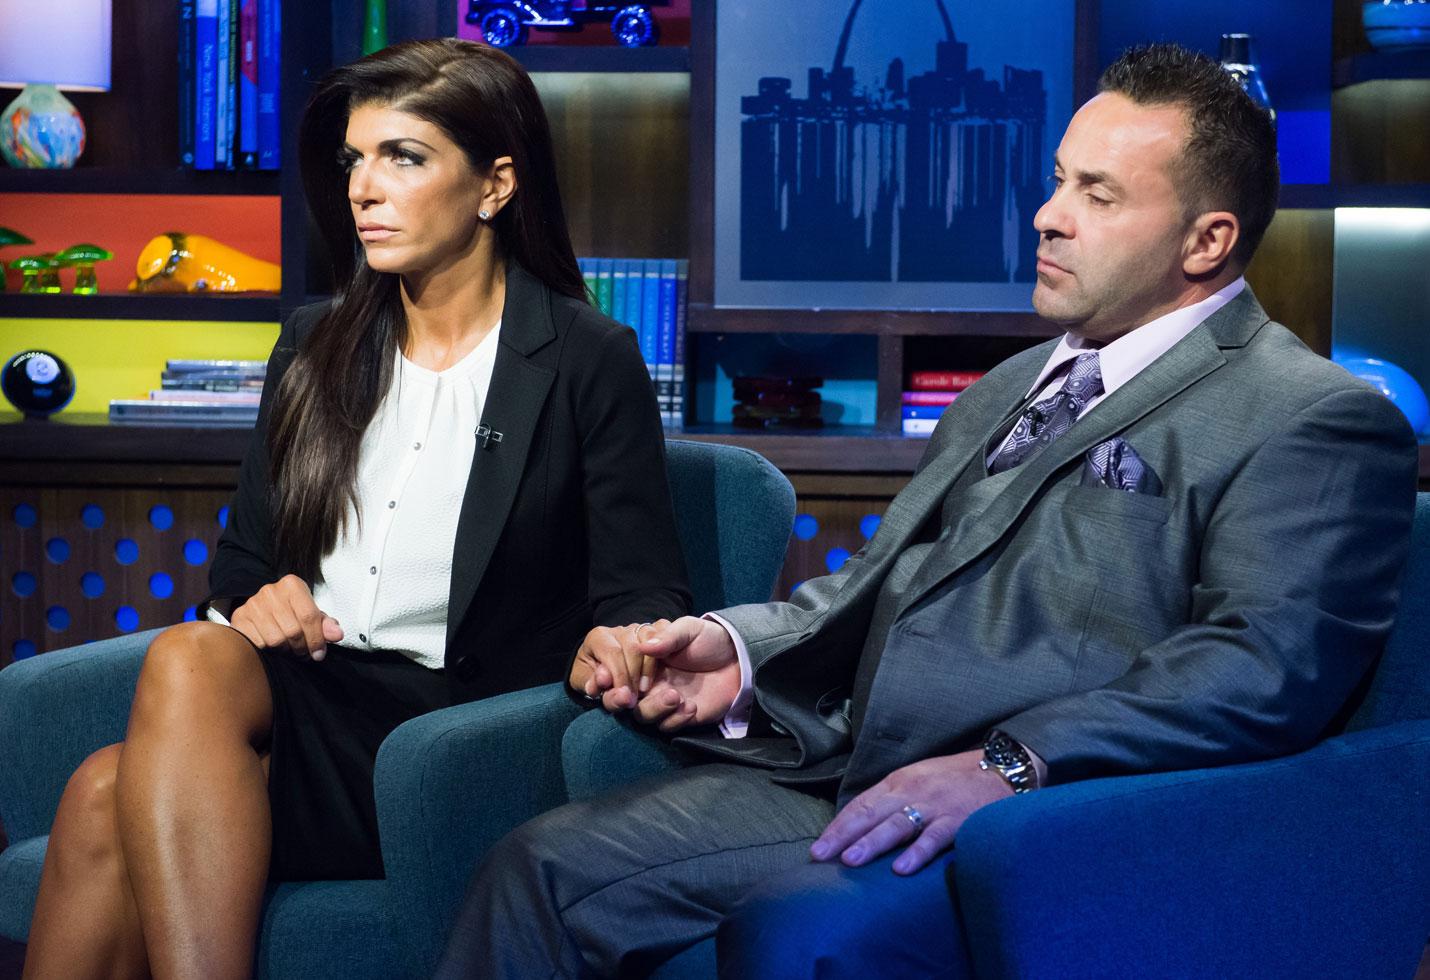 Teresa giudice husband Joe ice custody deportation RHONJ